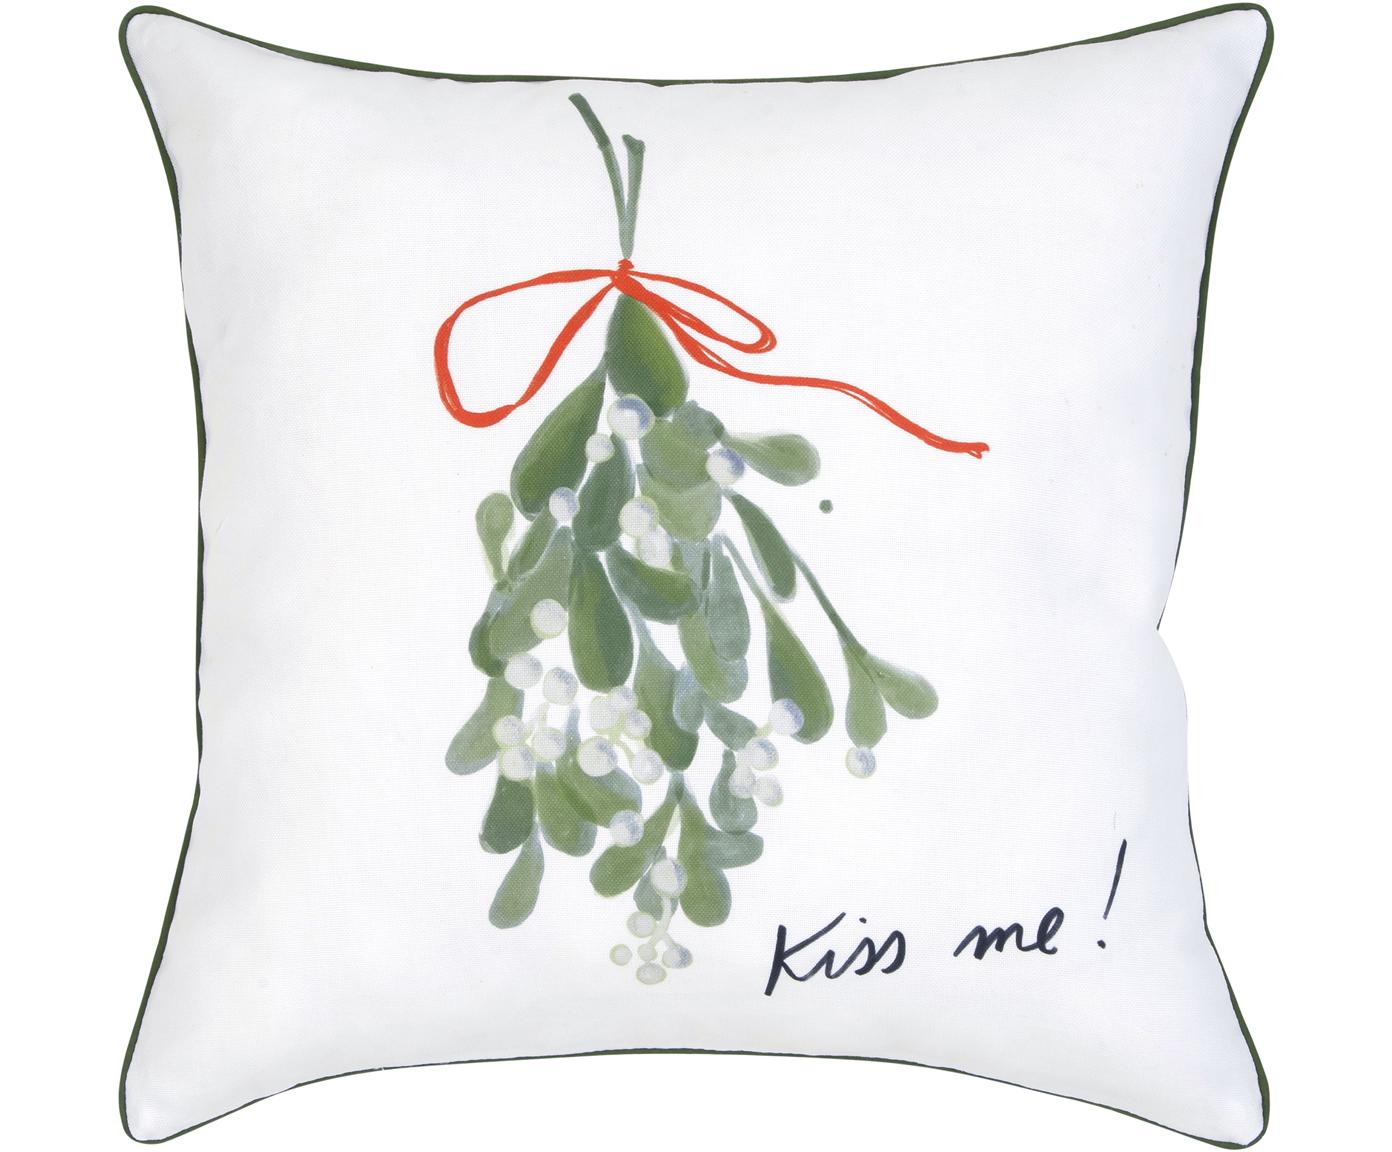 Designer Kissenhülle Kiss Me von Kera Till, 100% Baumwolle, Kissen: MehrfarbigKederumrandung: Grün, 40 x 40 cm